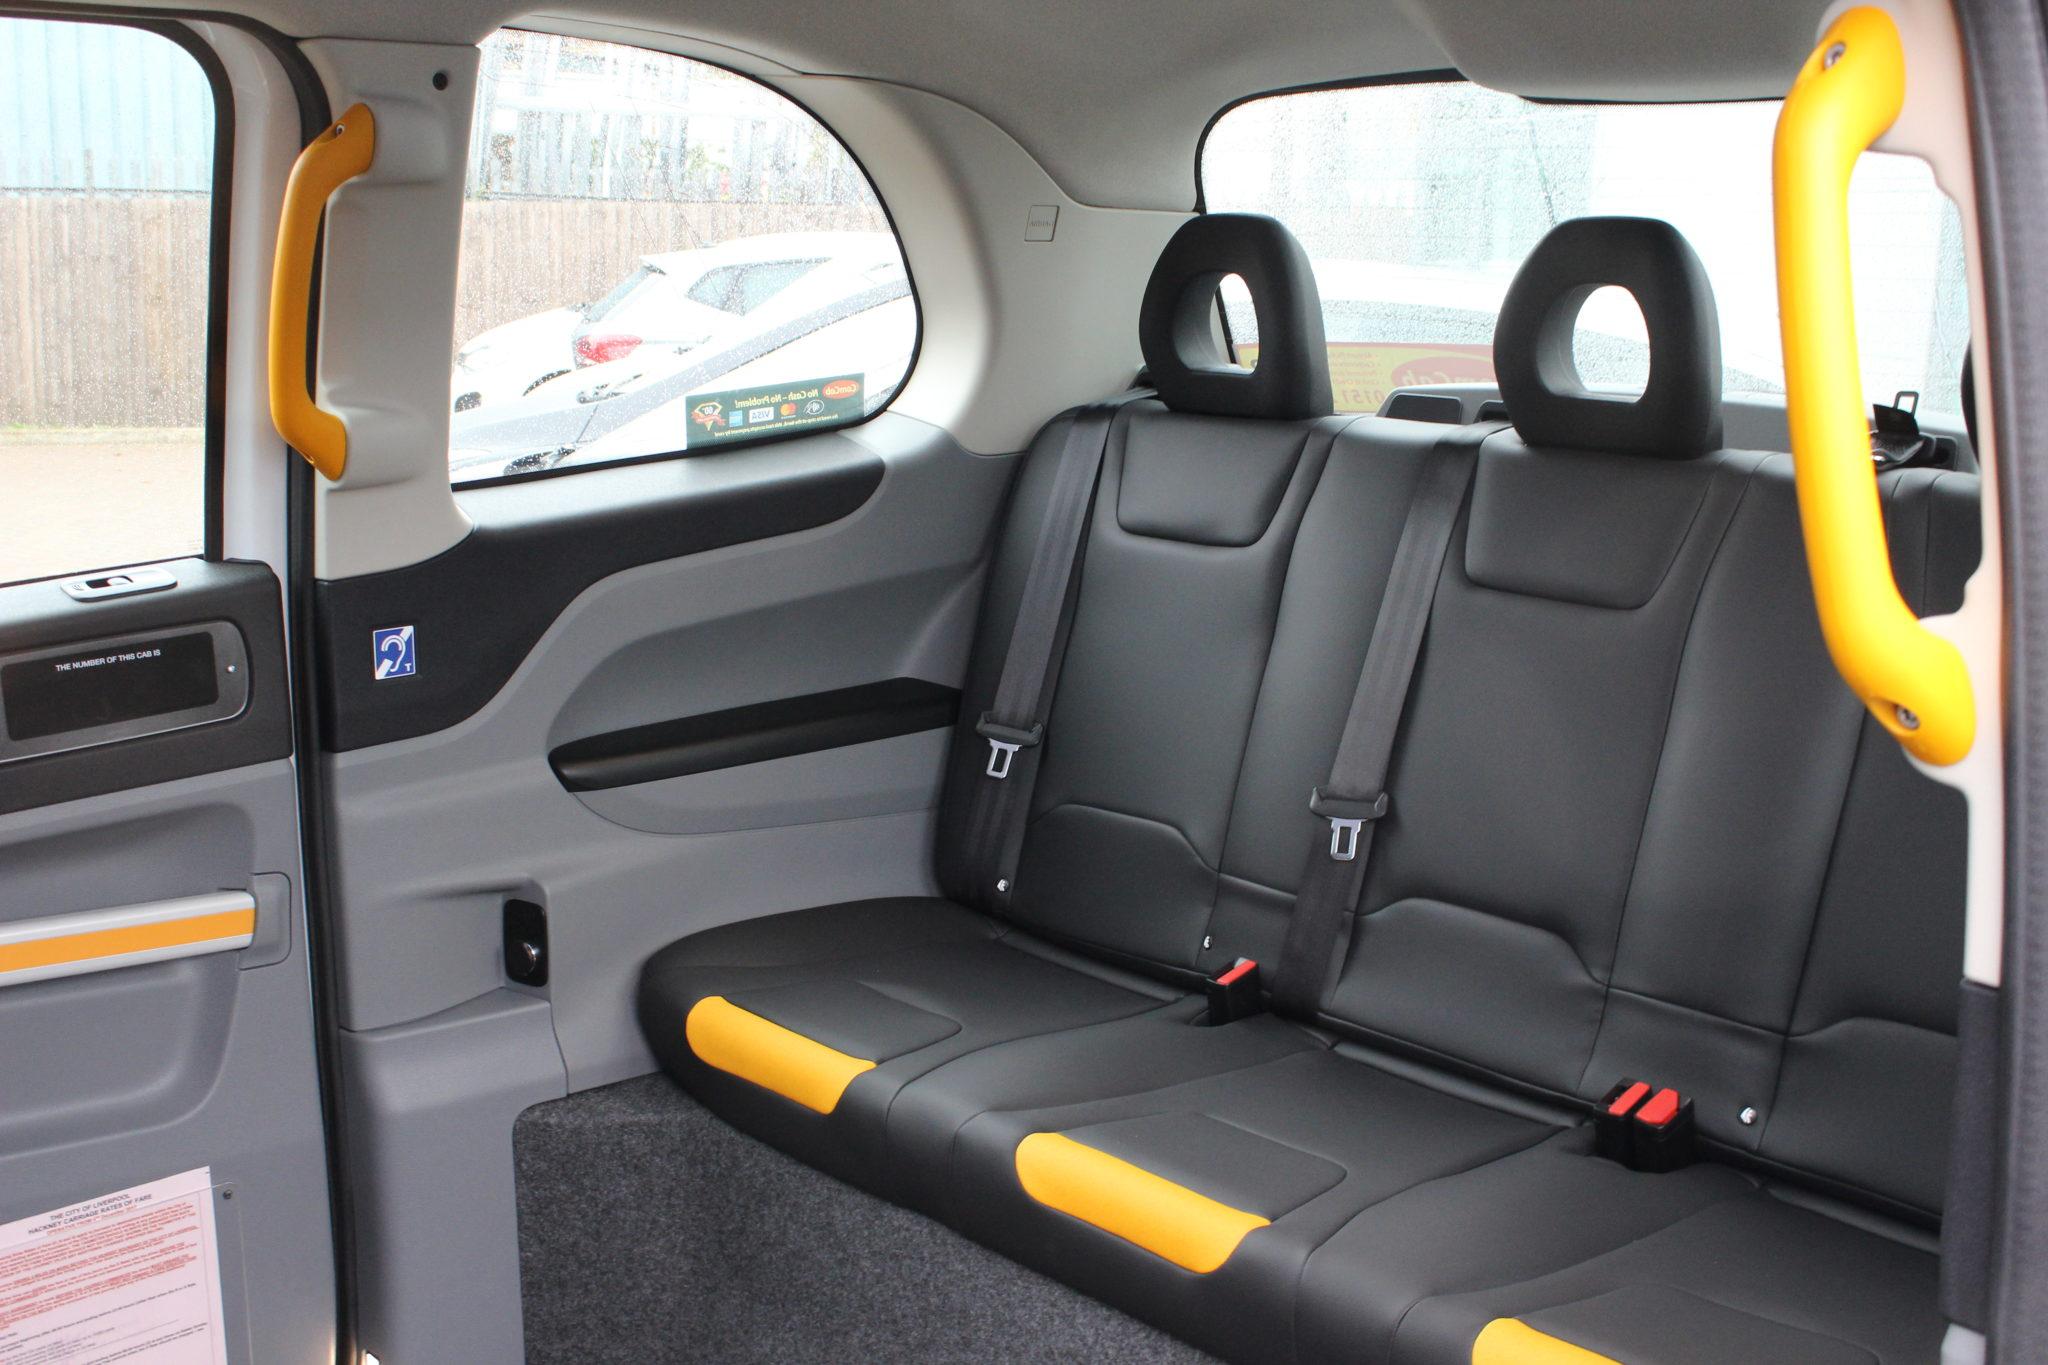 Electric Black Cab passenger seats